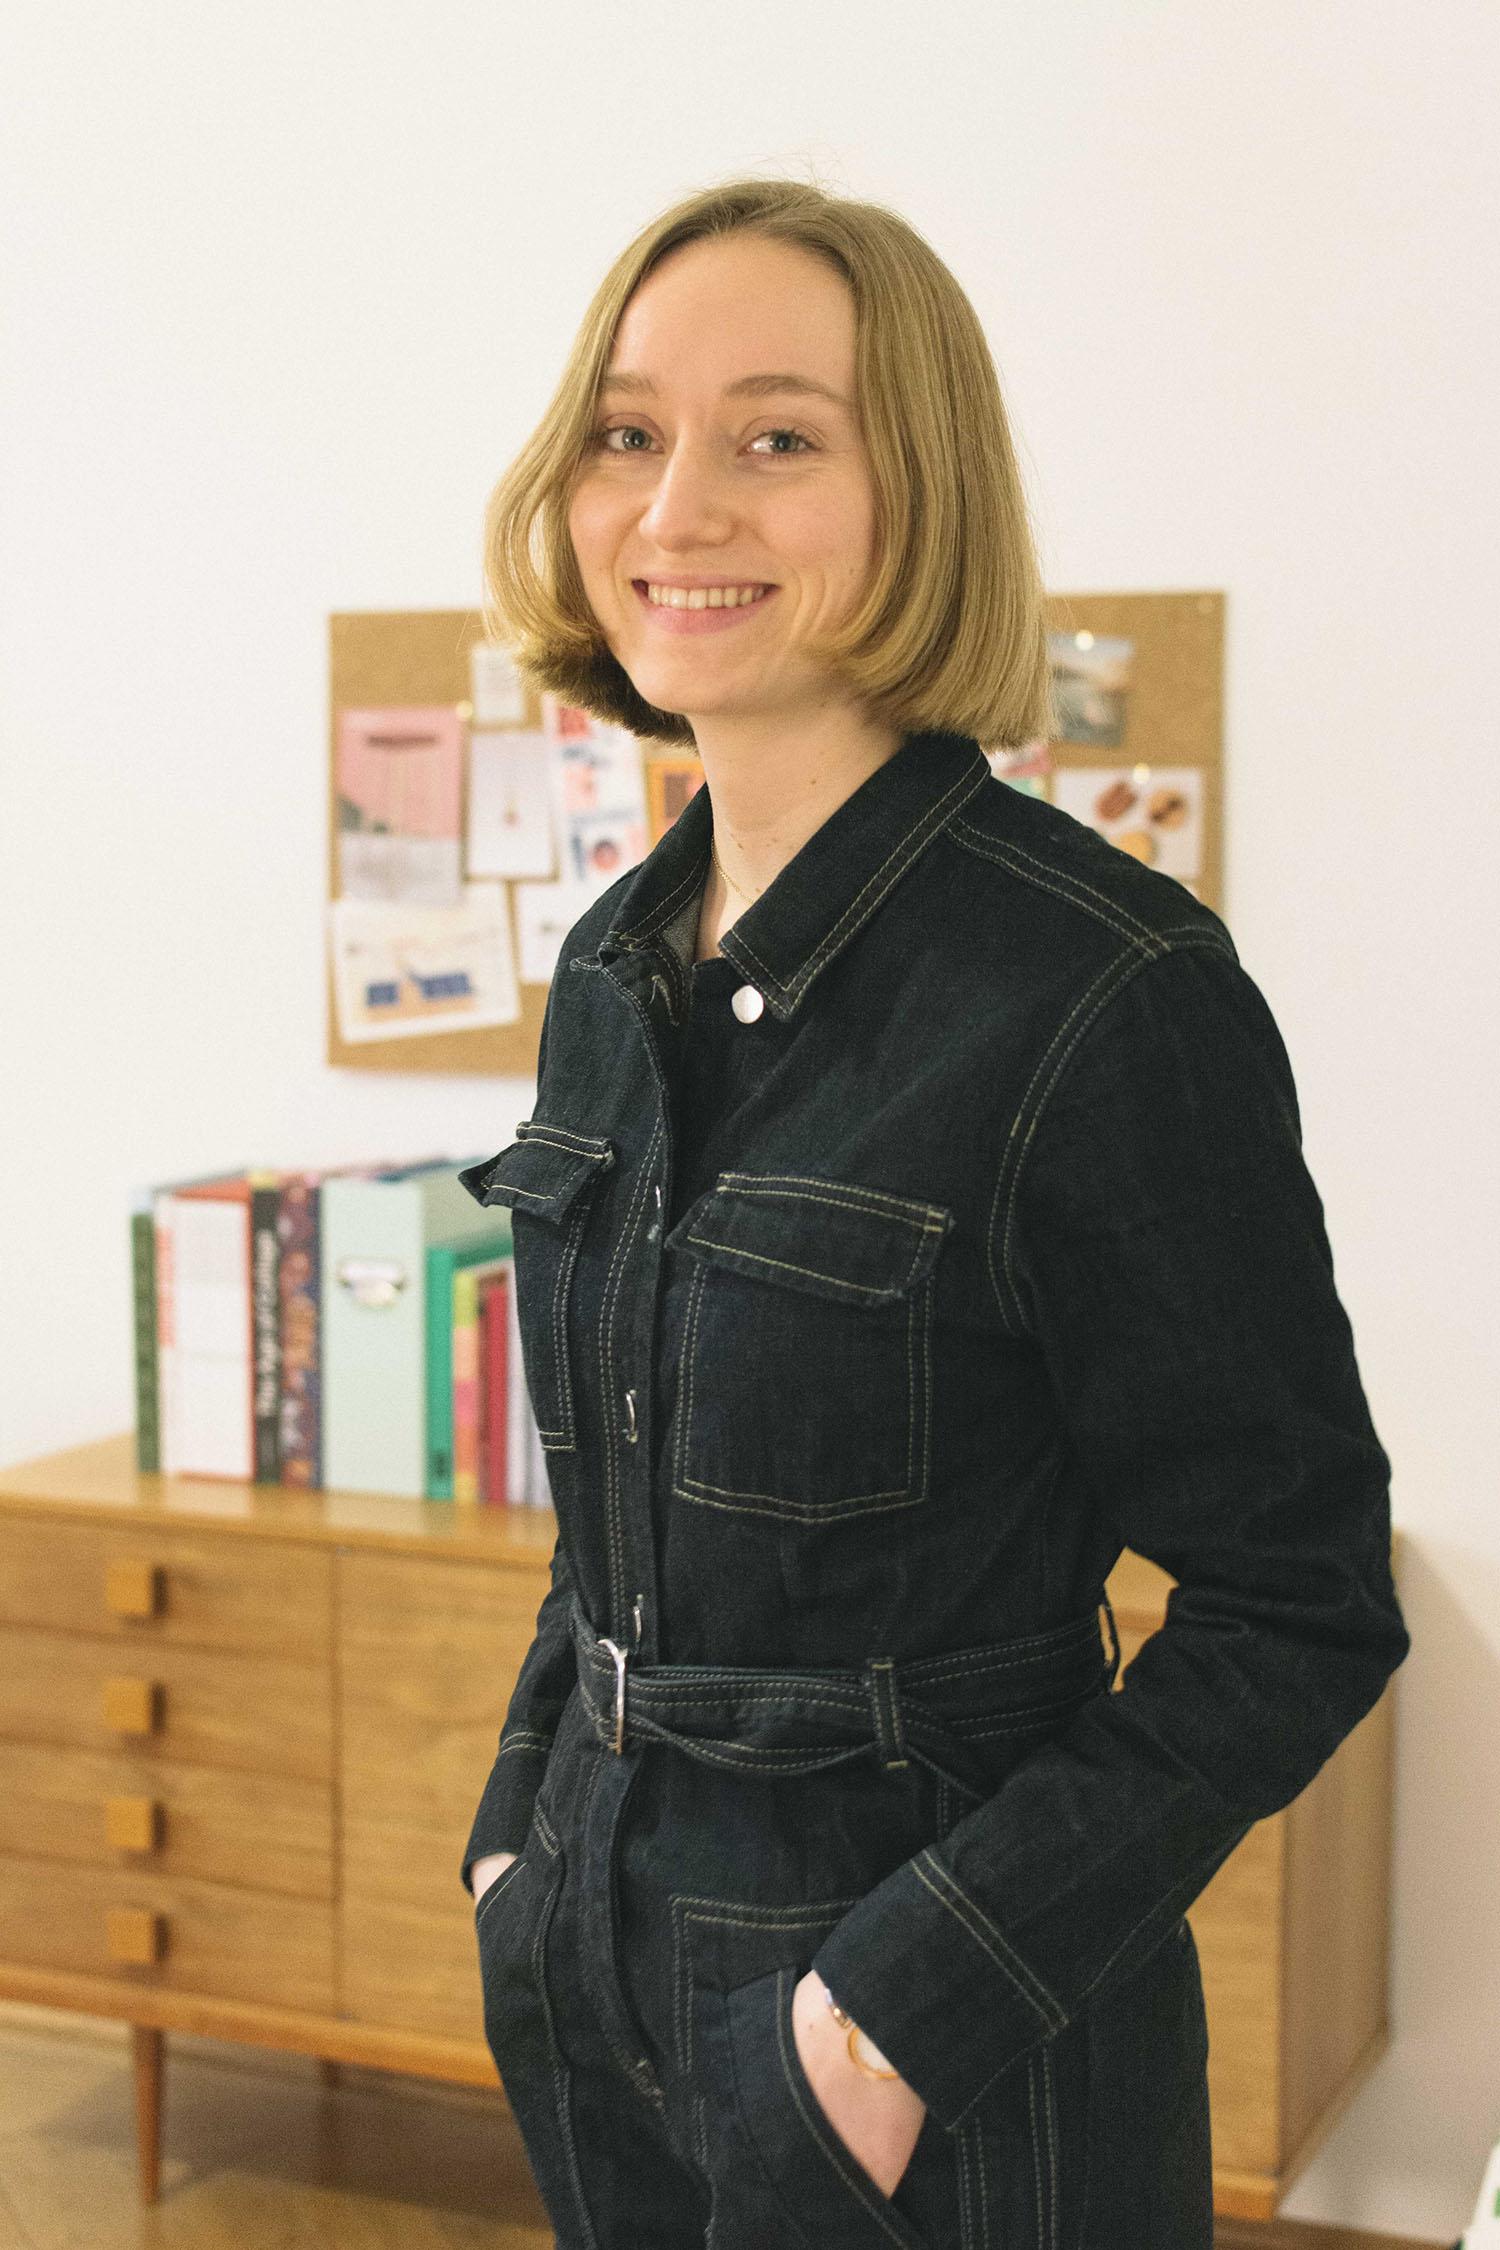 Magdalena Weiss - designer, photographer, Designerin, Fotografin